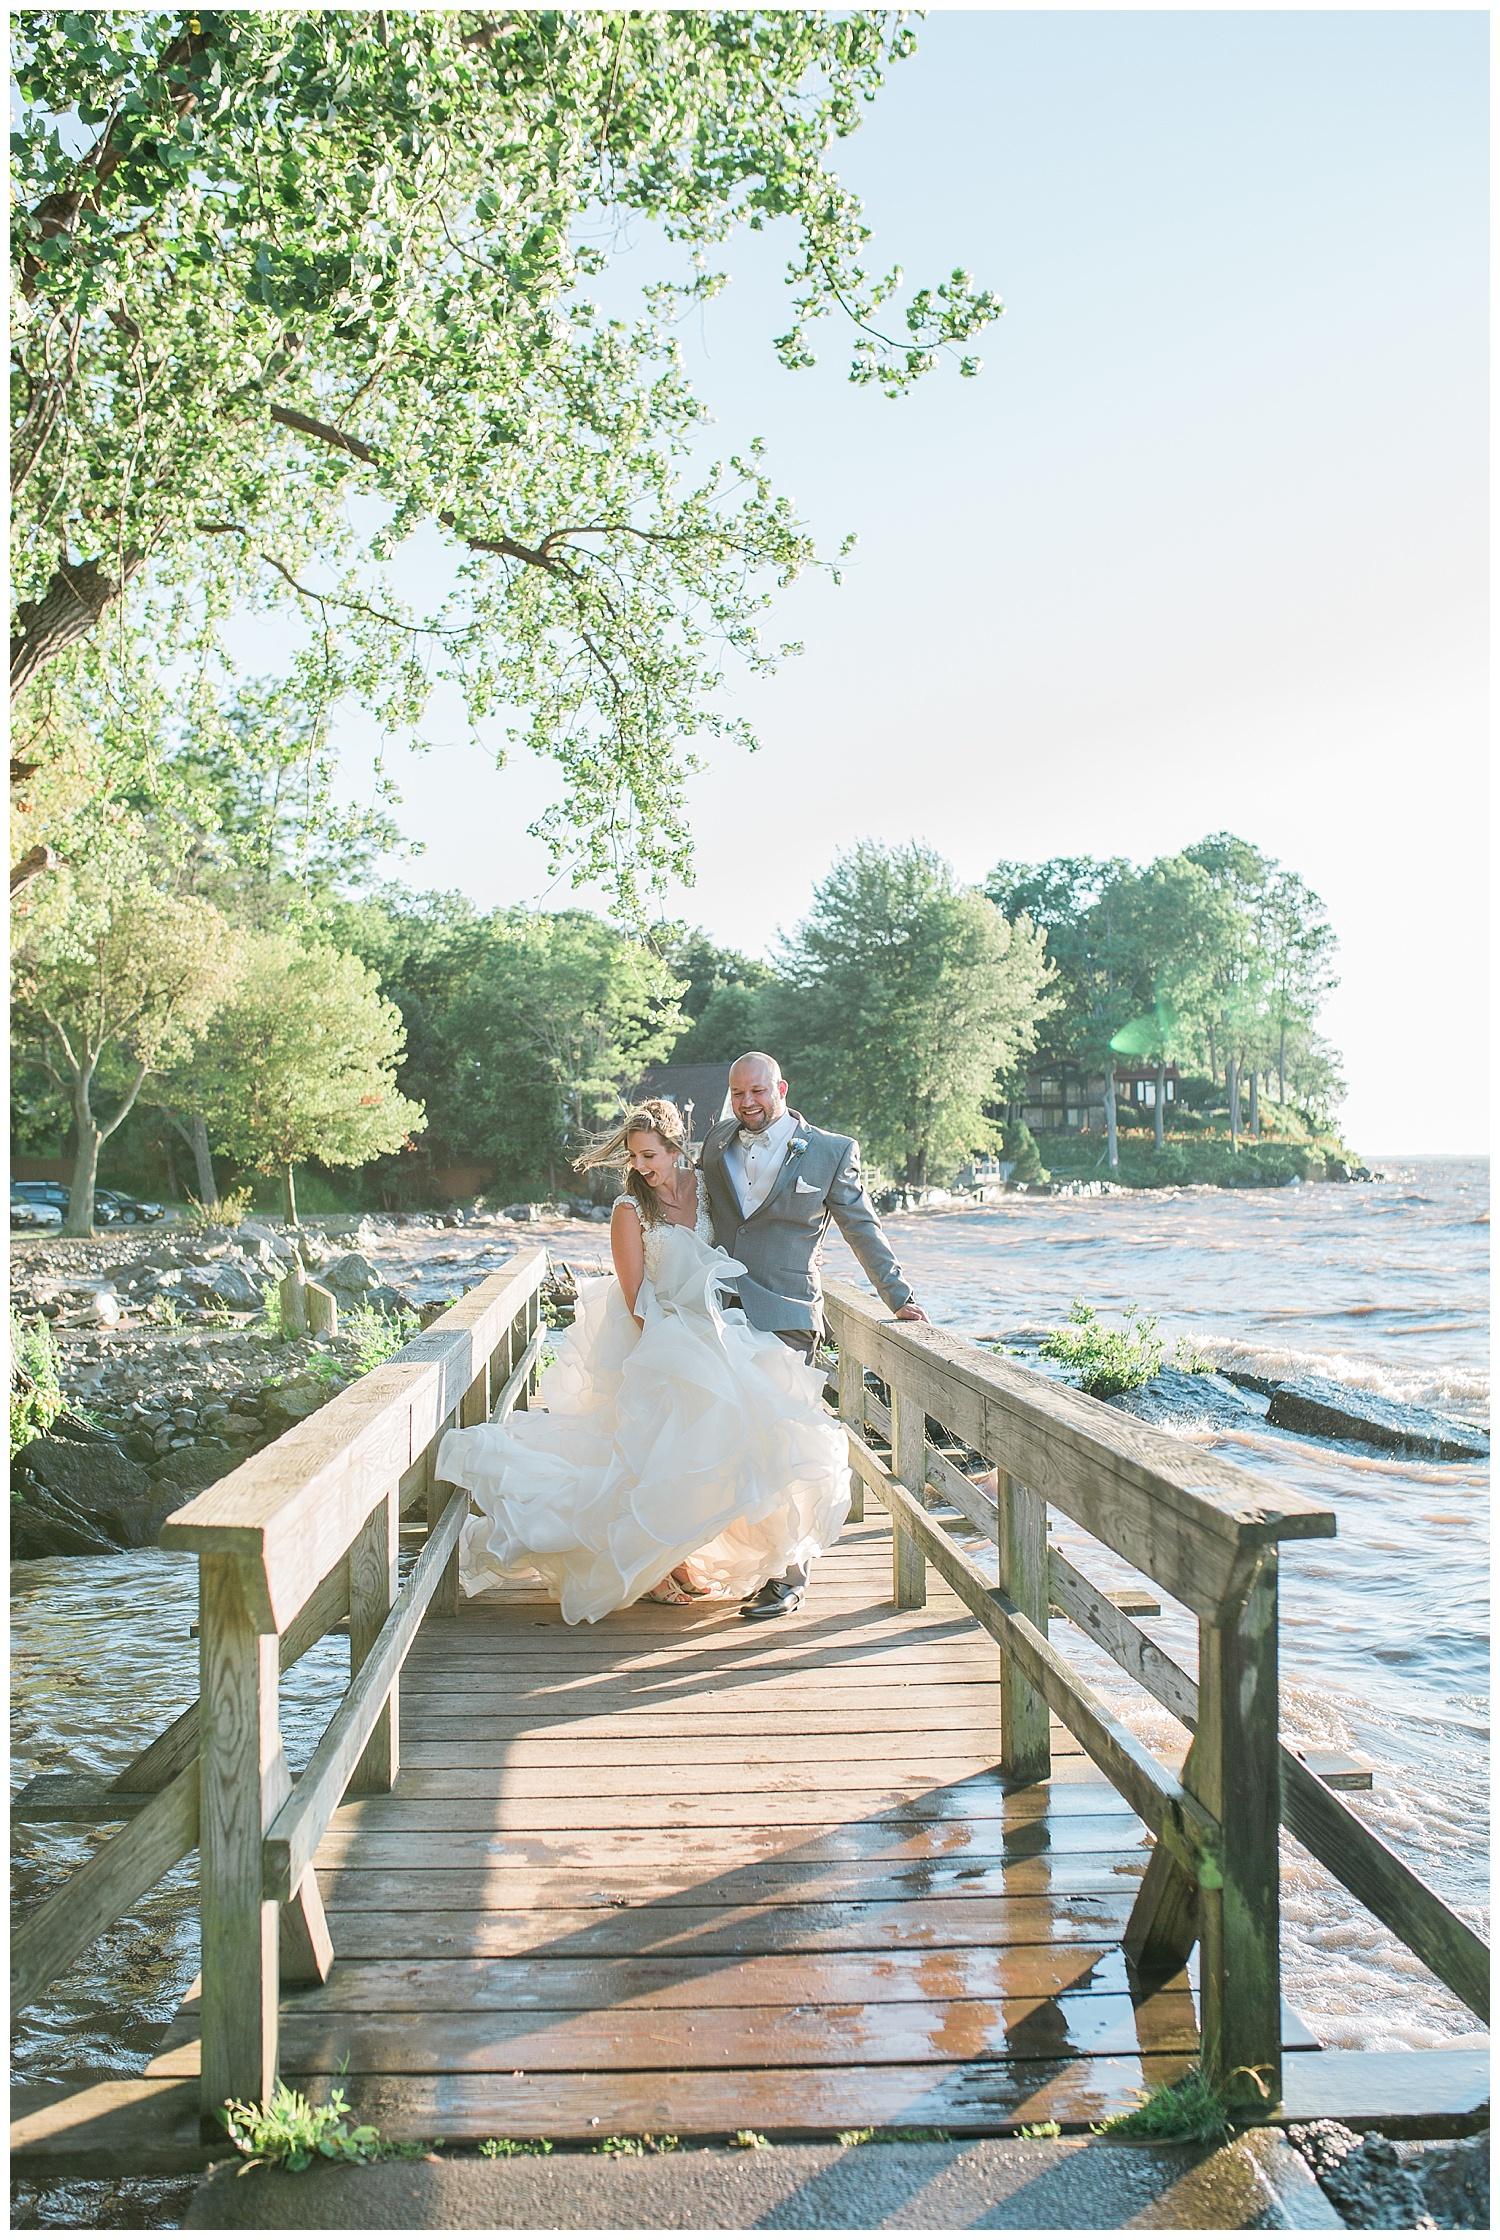 Sean and Andrea - Webster wedding - lass and beau-1090_Buffalo wedding photography.jpg